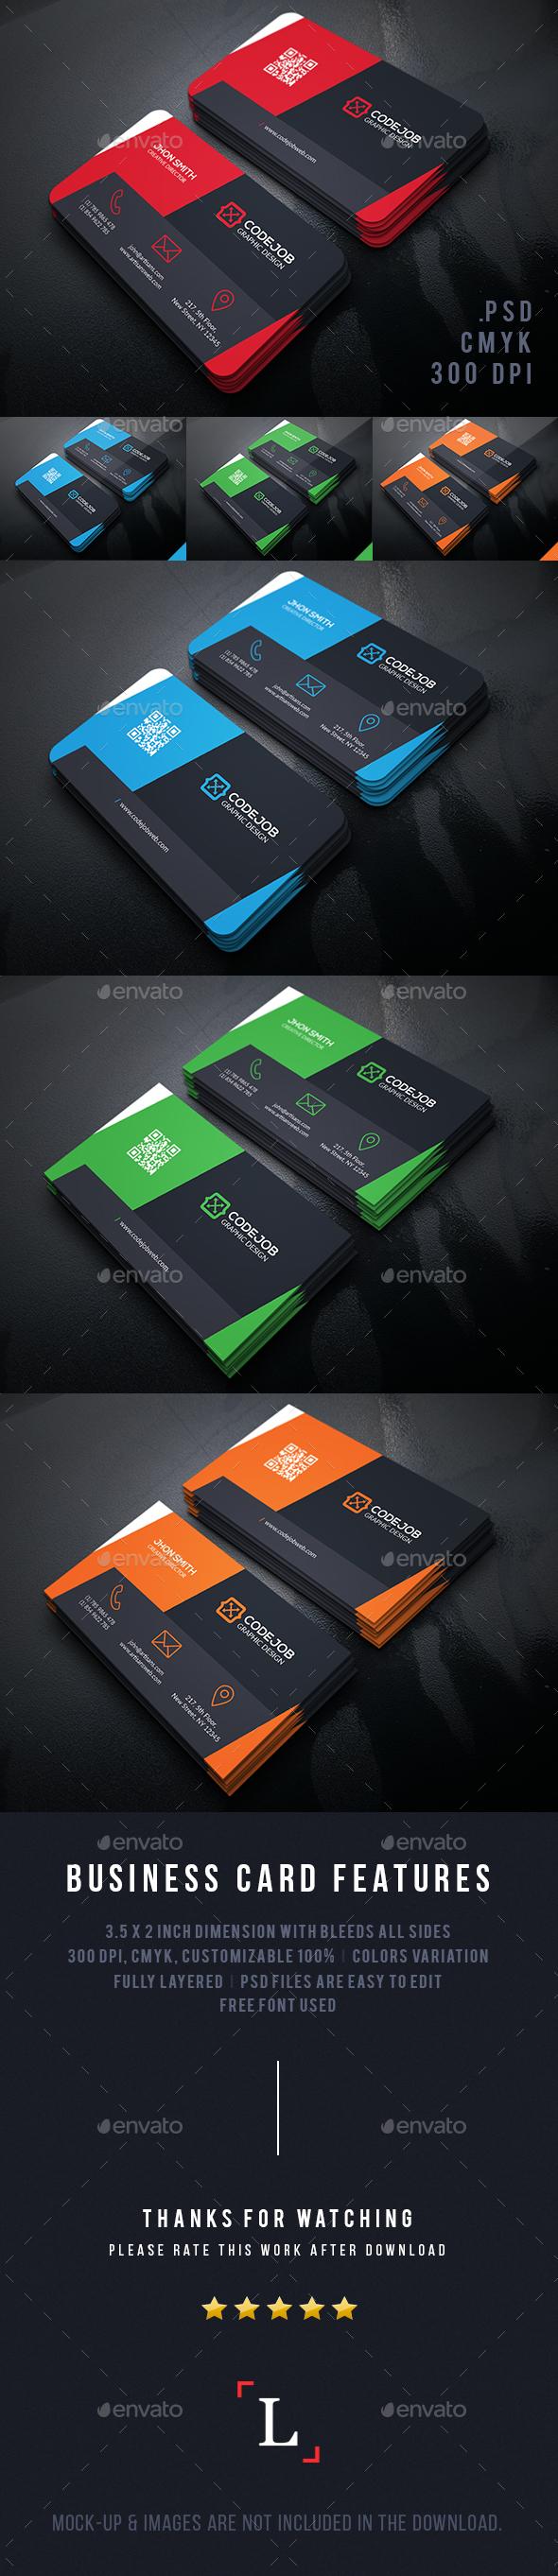 Shape Modern Business Cards - Business Cards Print Templates